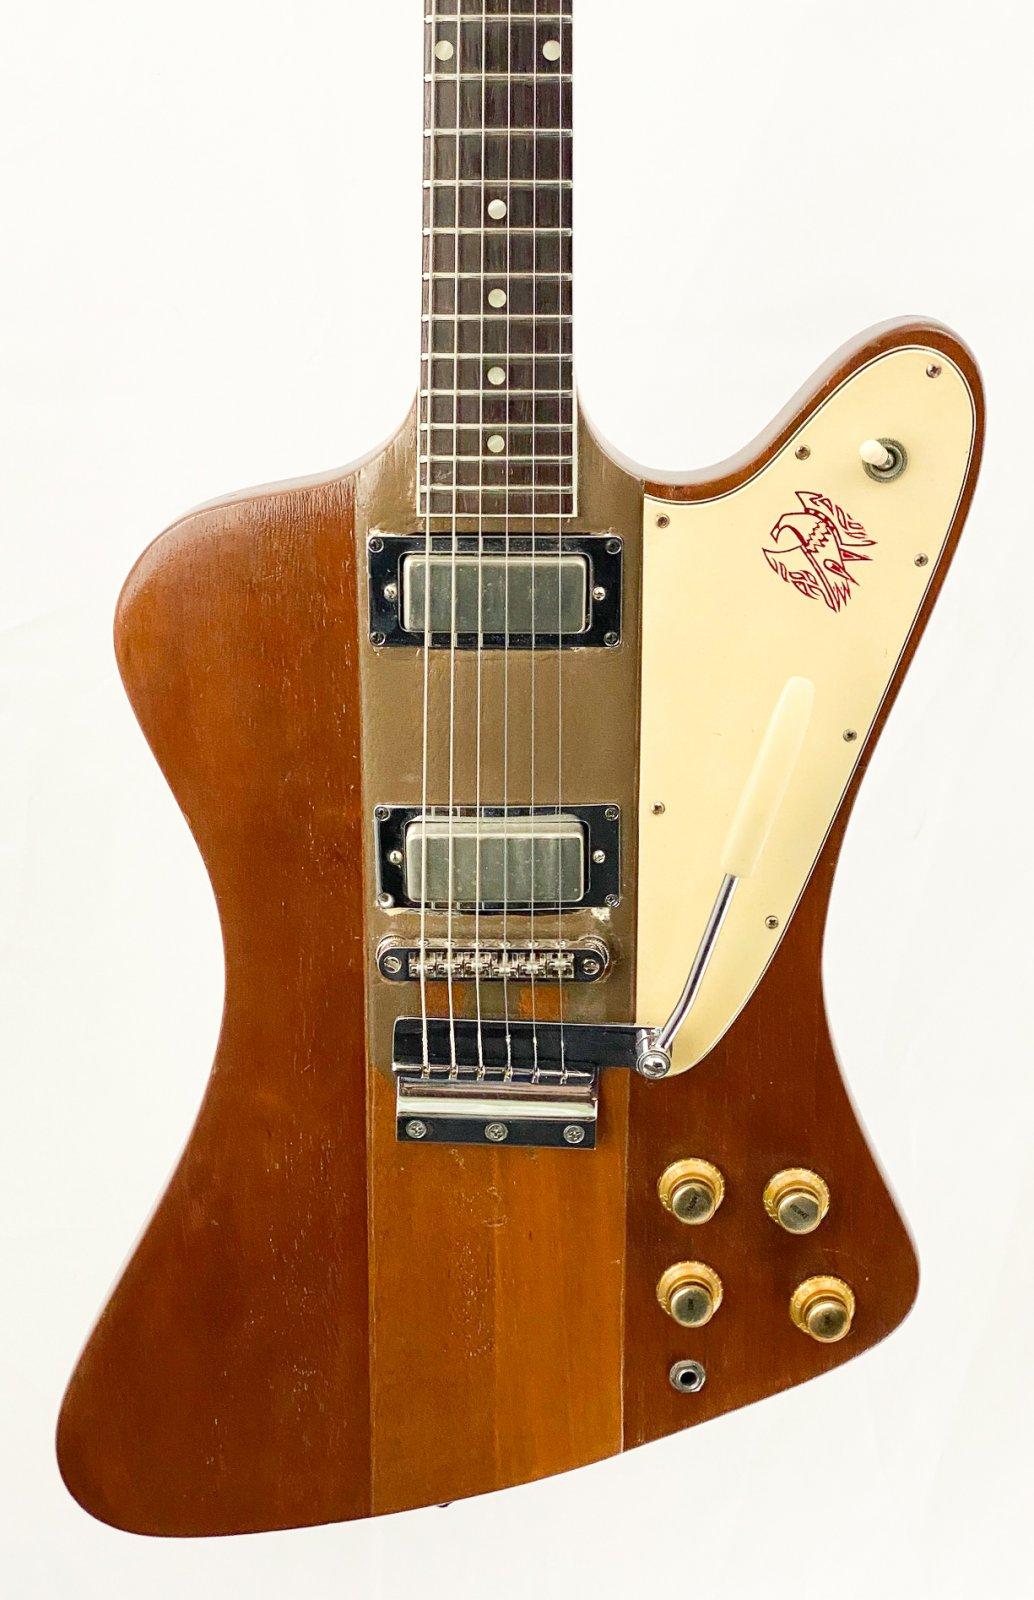 Vintage 1963 Gibson Firebird III - reverse body, neck through w/HSC